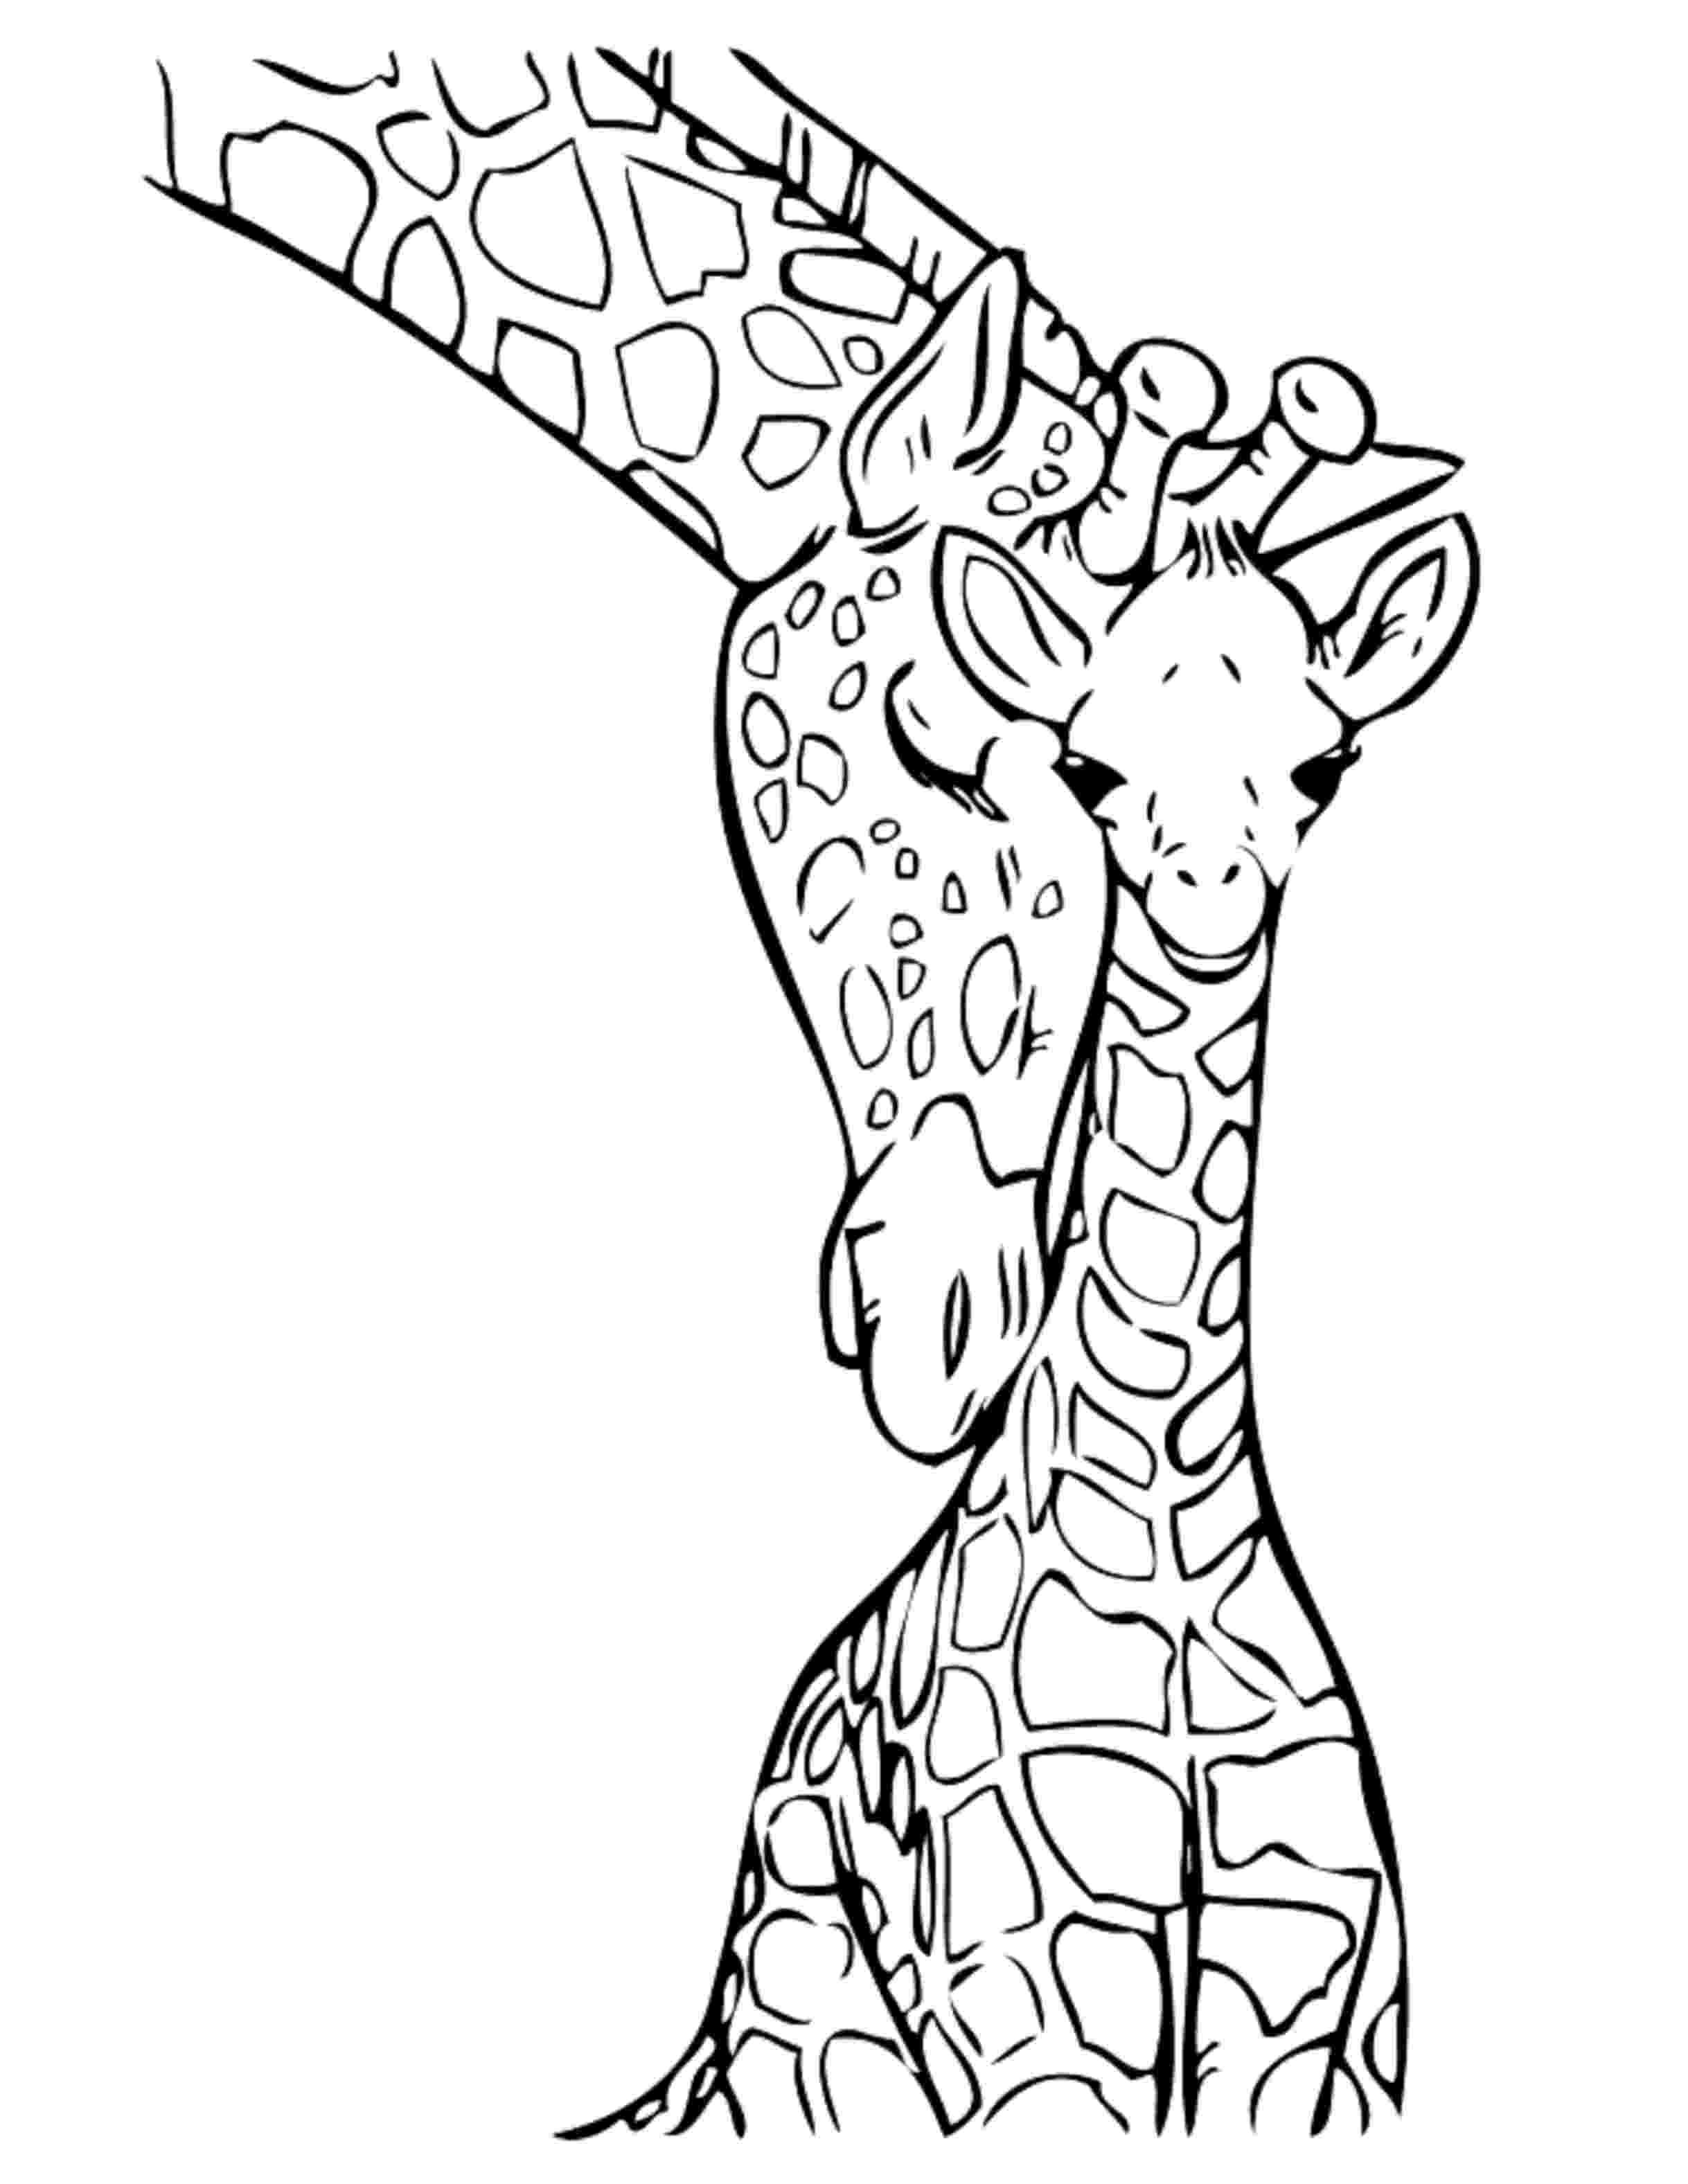 coloring page giraffe print download giraffe coloring pages for kids to have fun giraffe coloring page